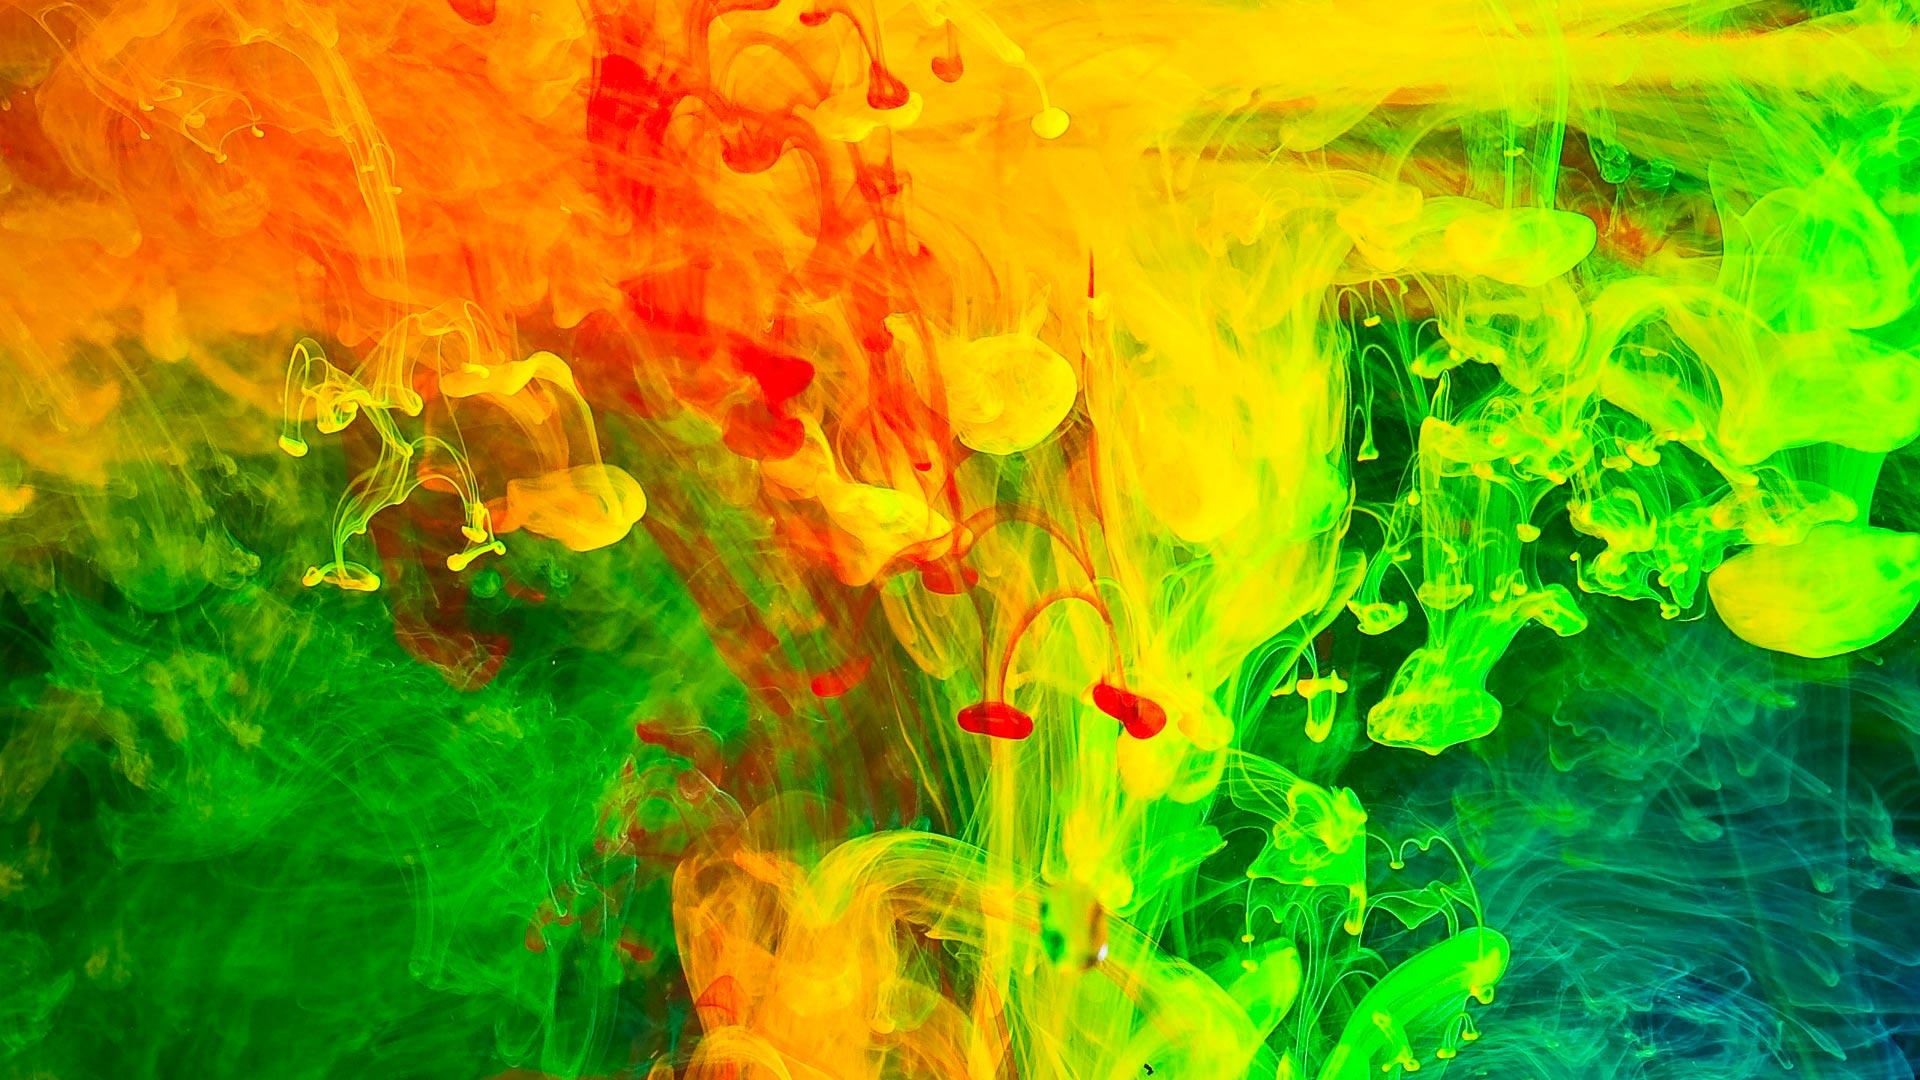 [Resim: paint_texture2131g4s5z.jpg]